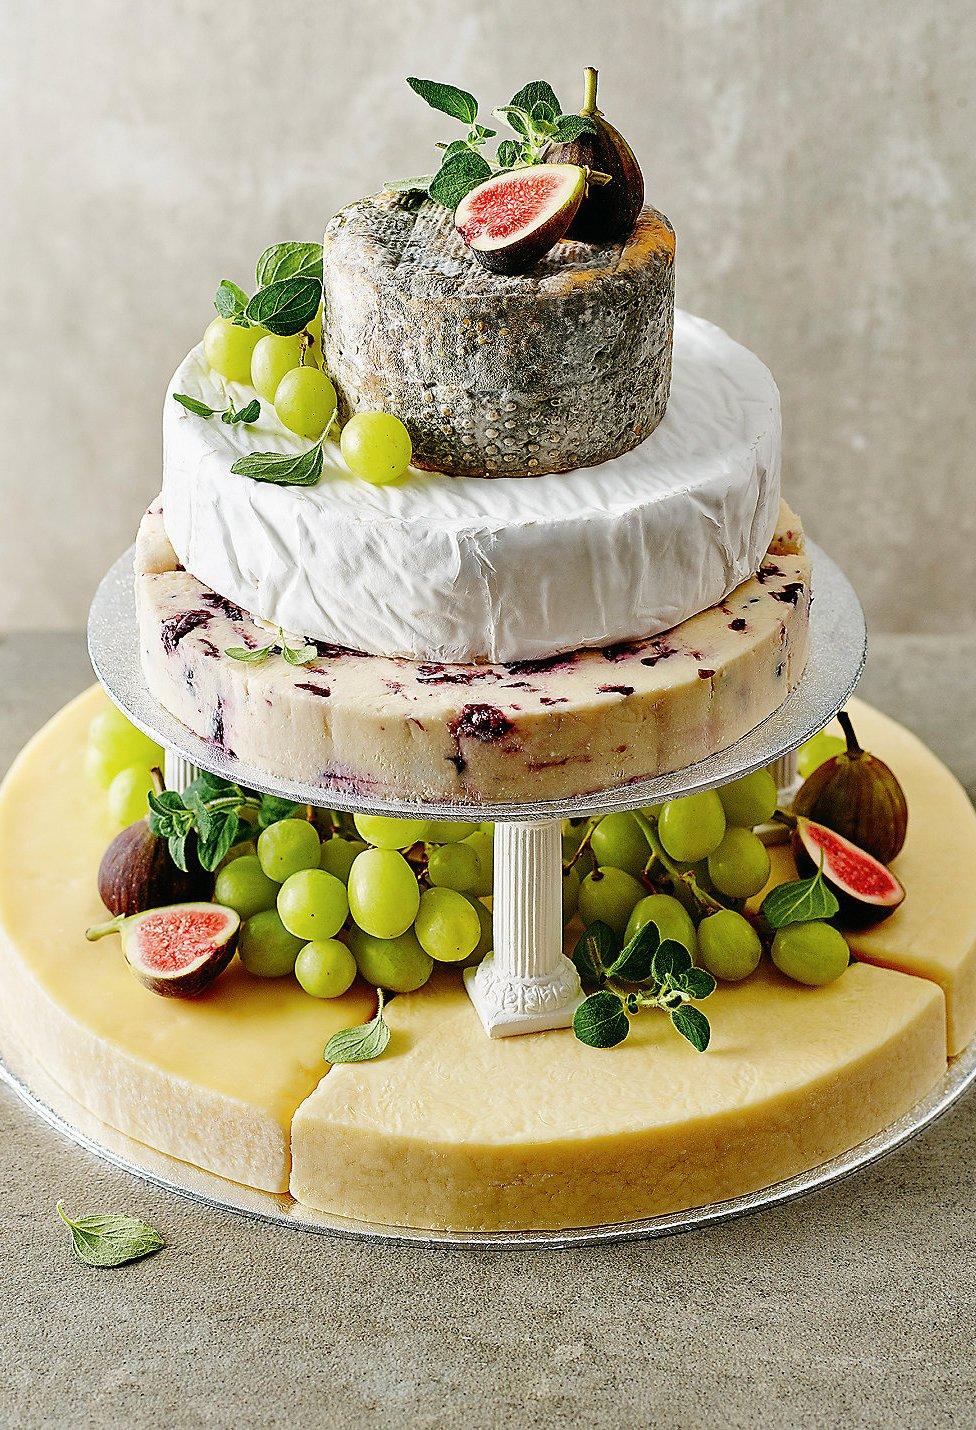 Small cheese cake